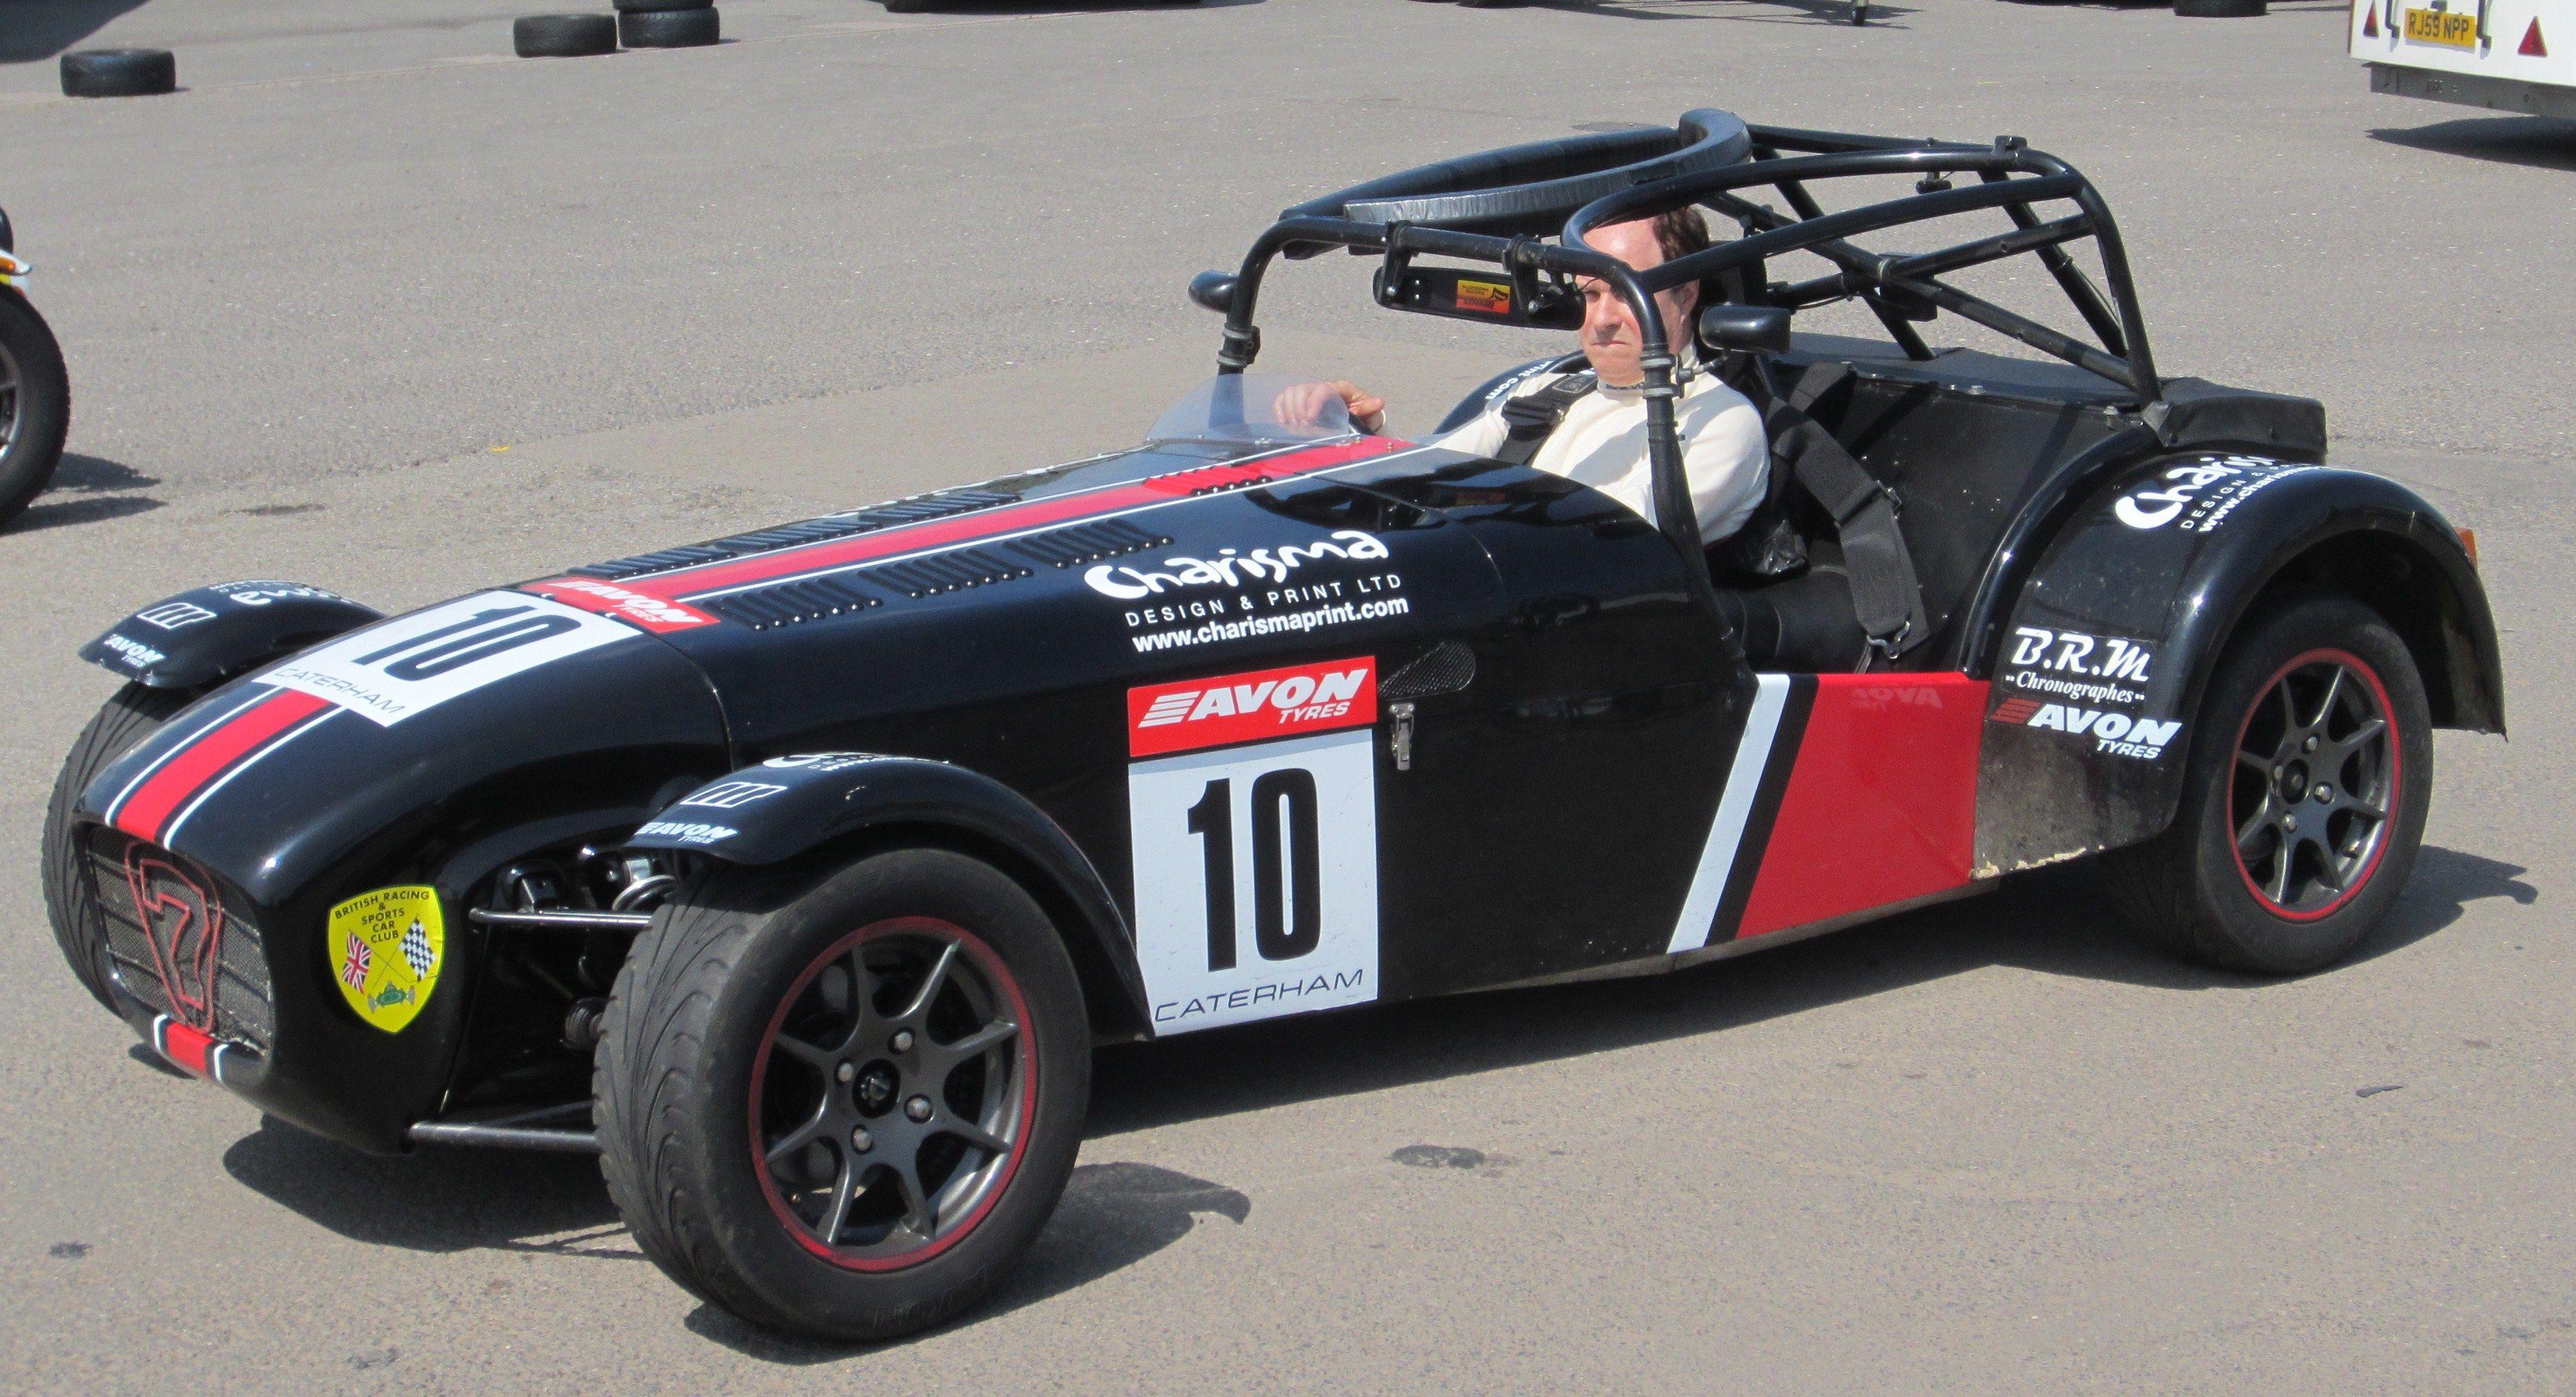 Supersport car, similar to Tracksport but improved suspension plus more power, 140bhp.